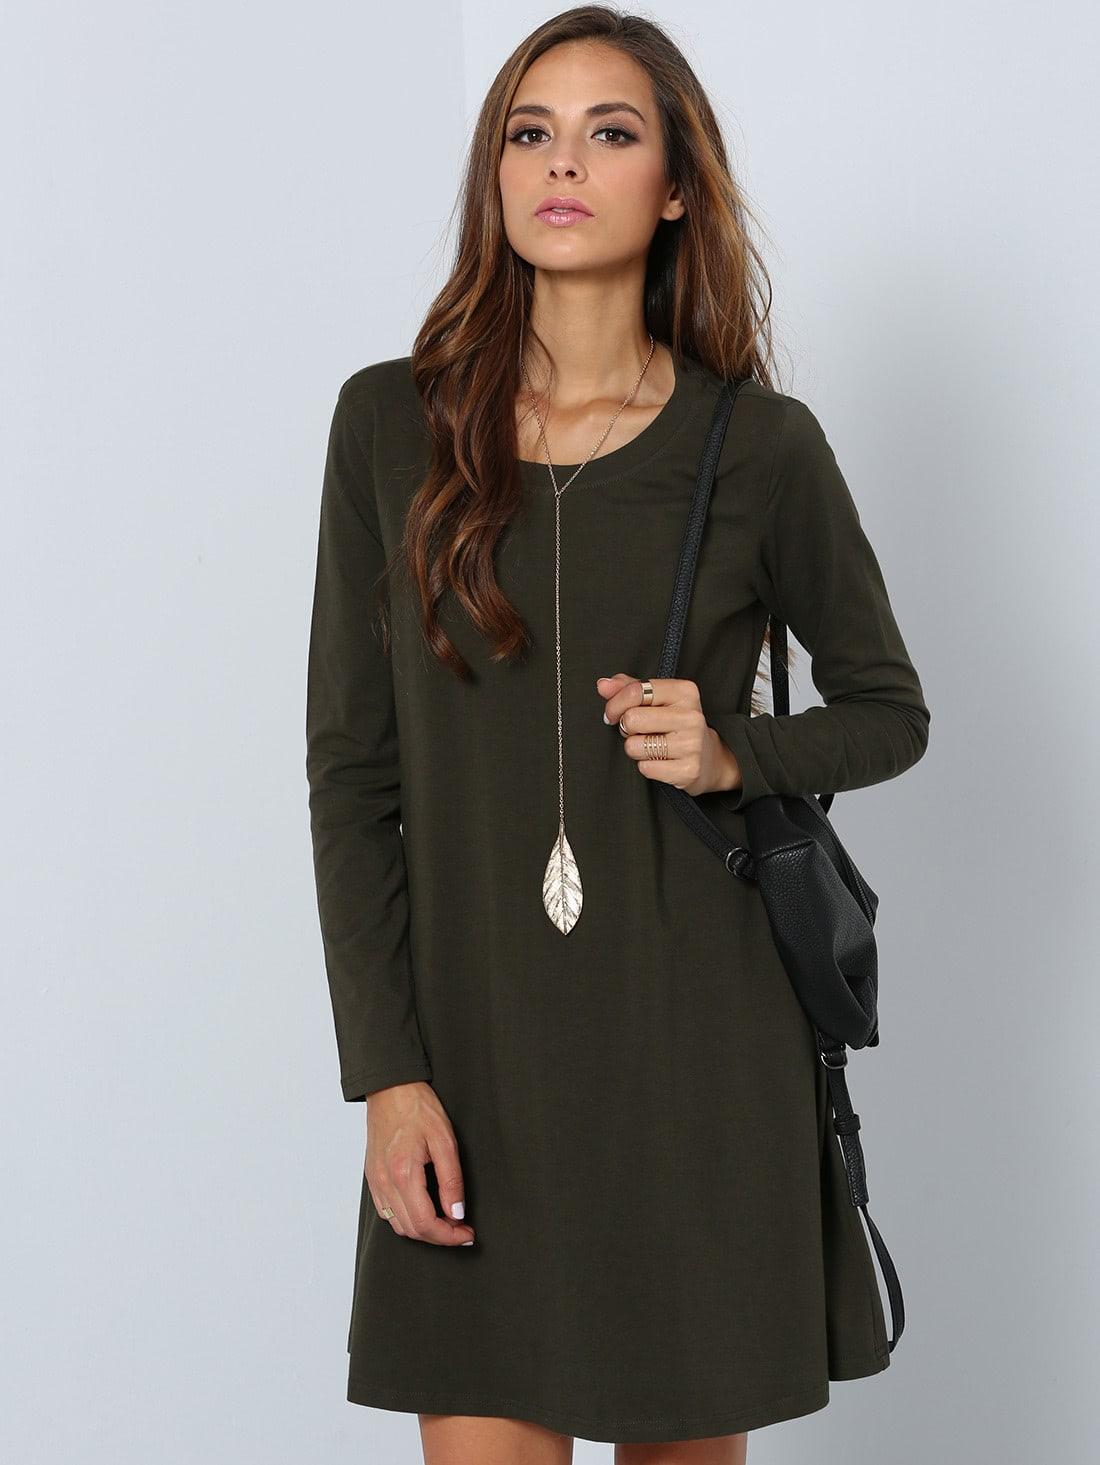 Moderne kleider langarm